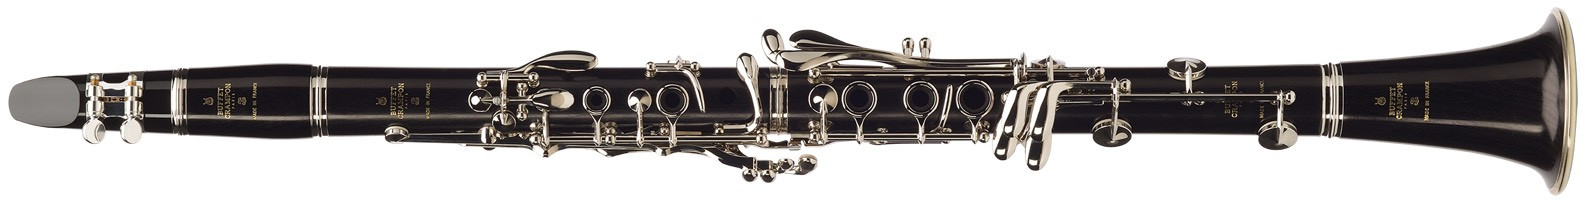 Buffet Crampon R13 Clarinet Bb Clarinet silver keys or nickel keys